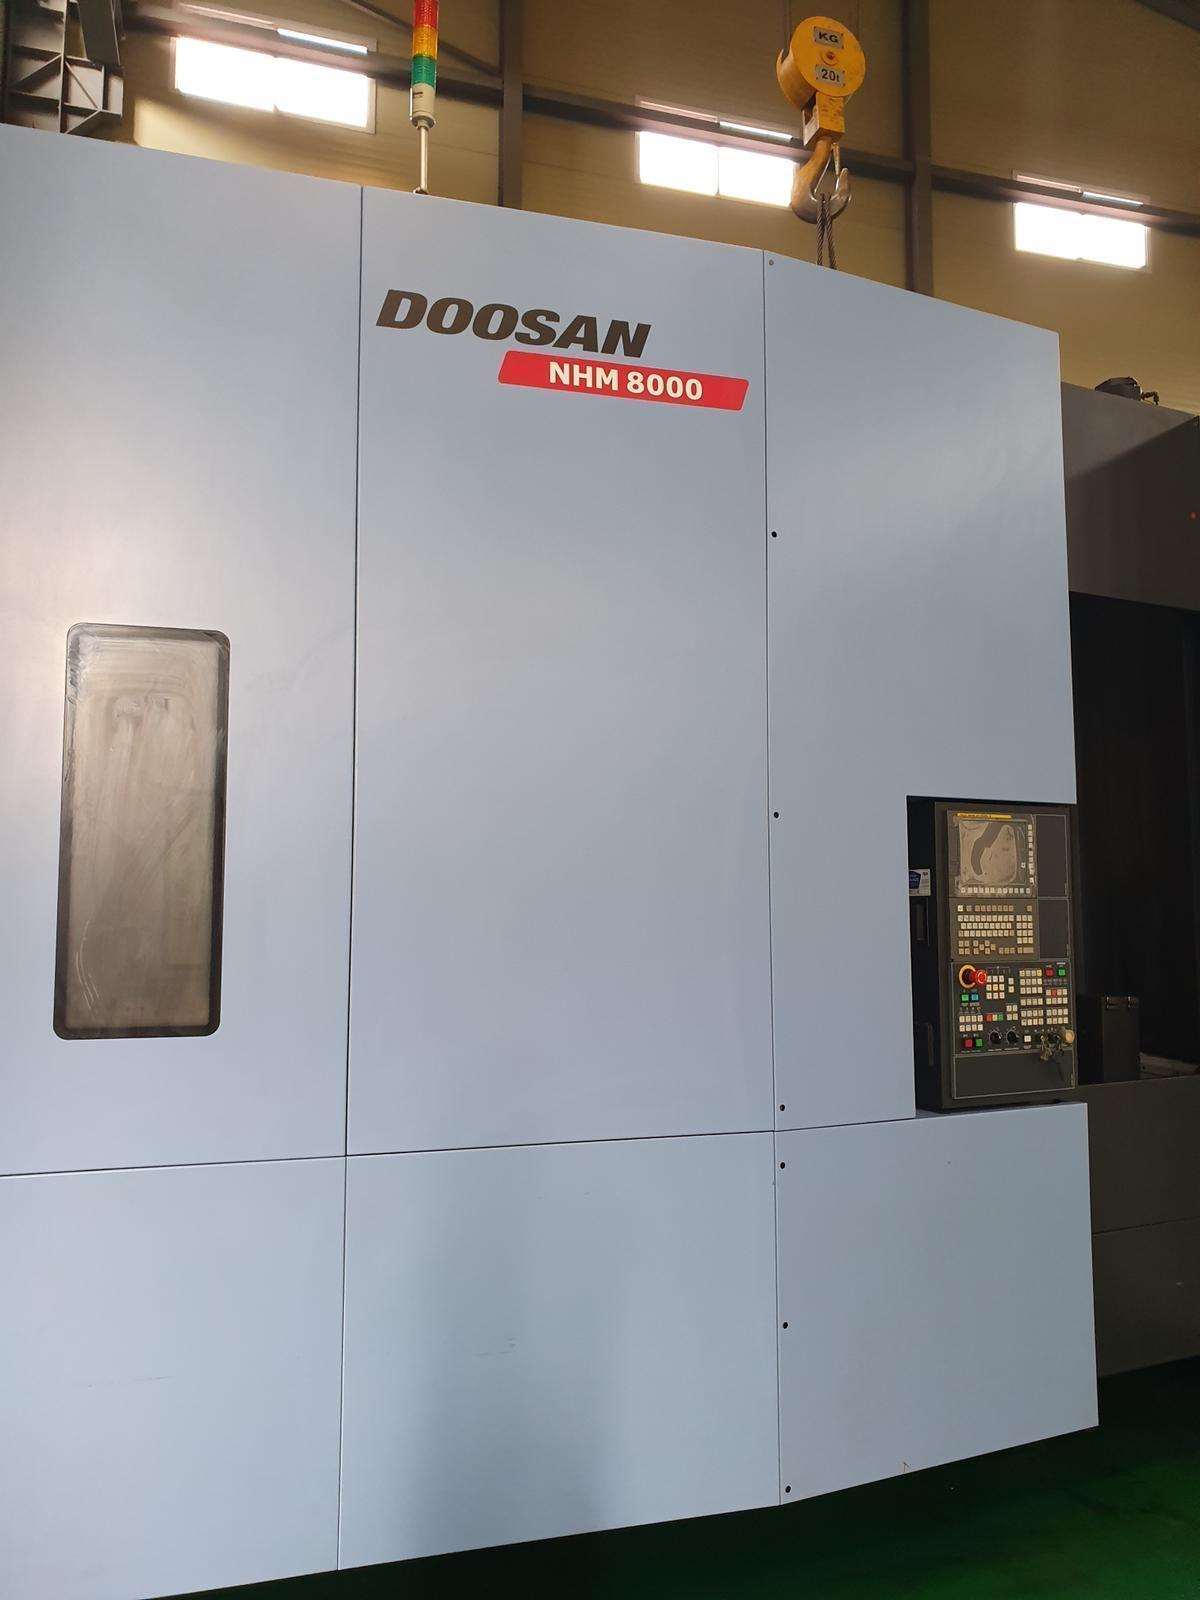 Doosan NHM 8000 CNC Horizontal Machining Center